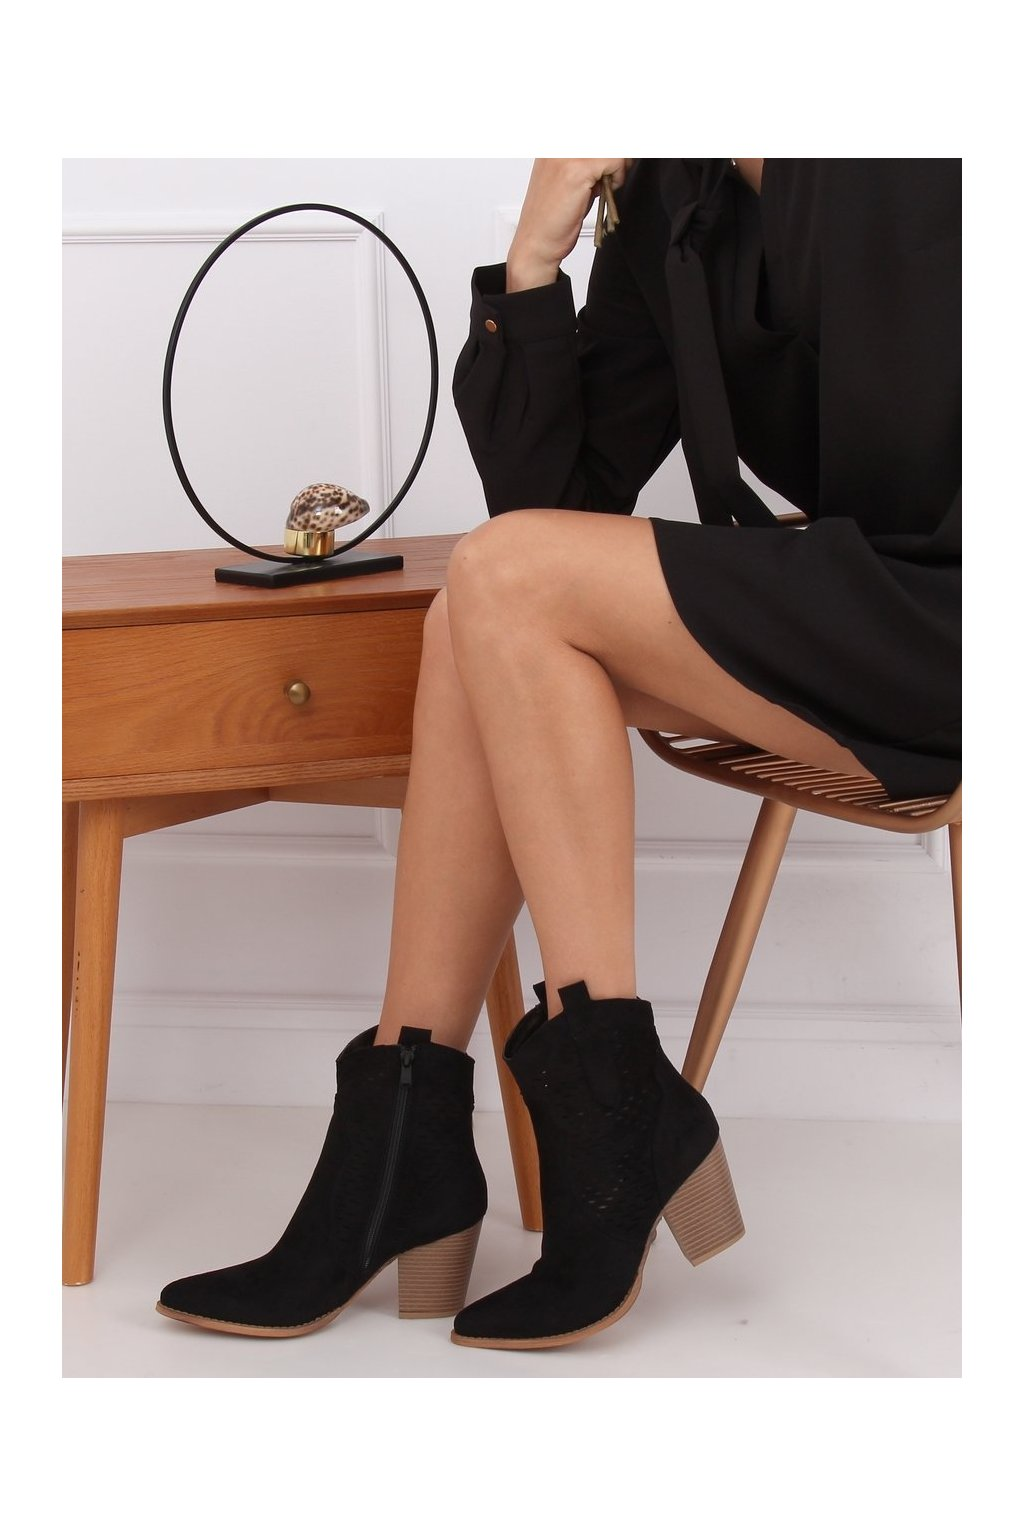 Dámske členkové topánky čierne na širokom podpätku ZE05P